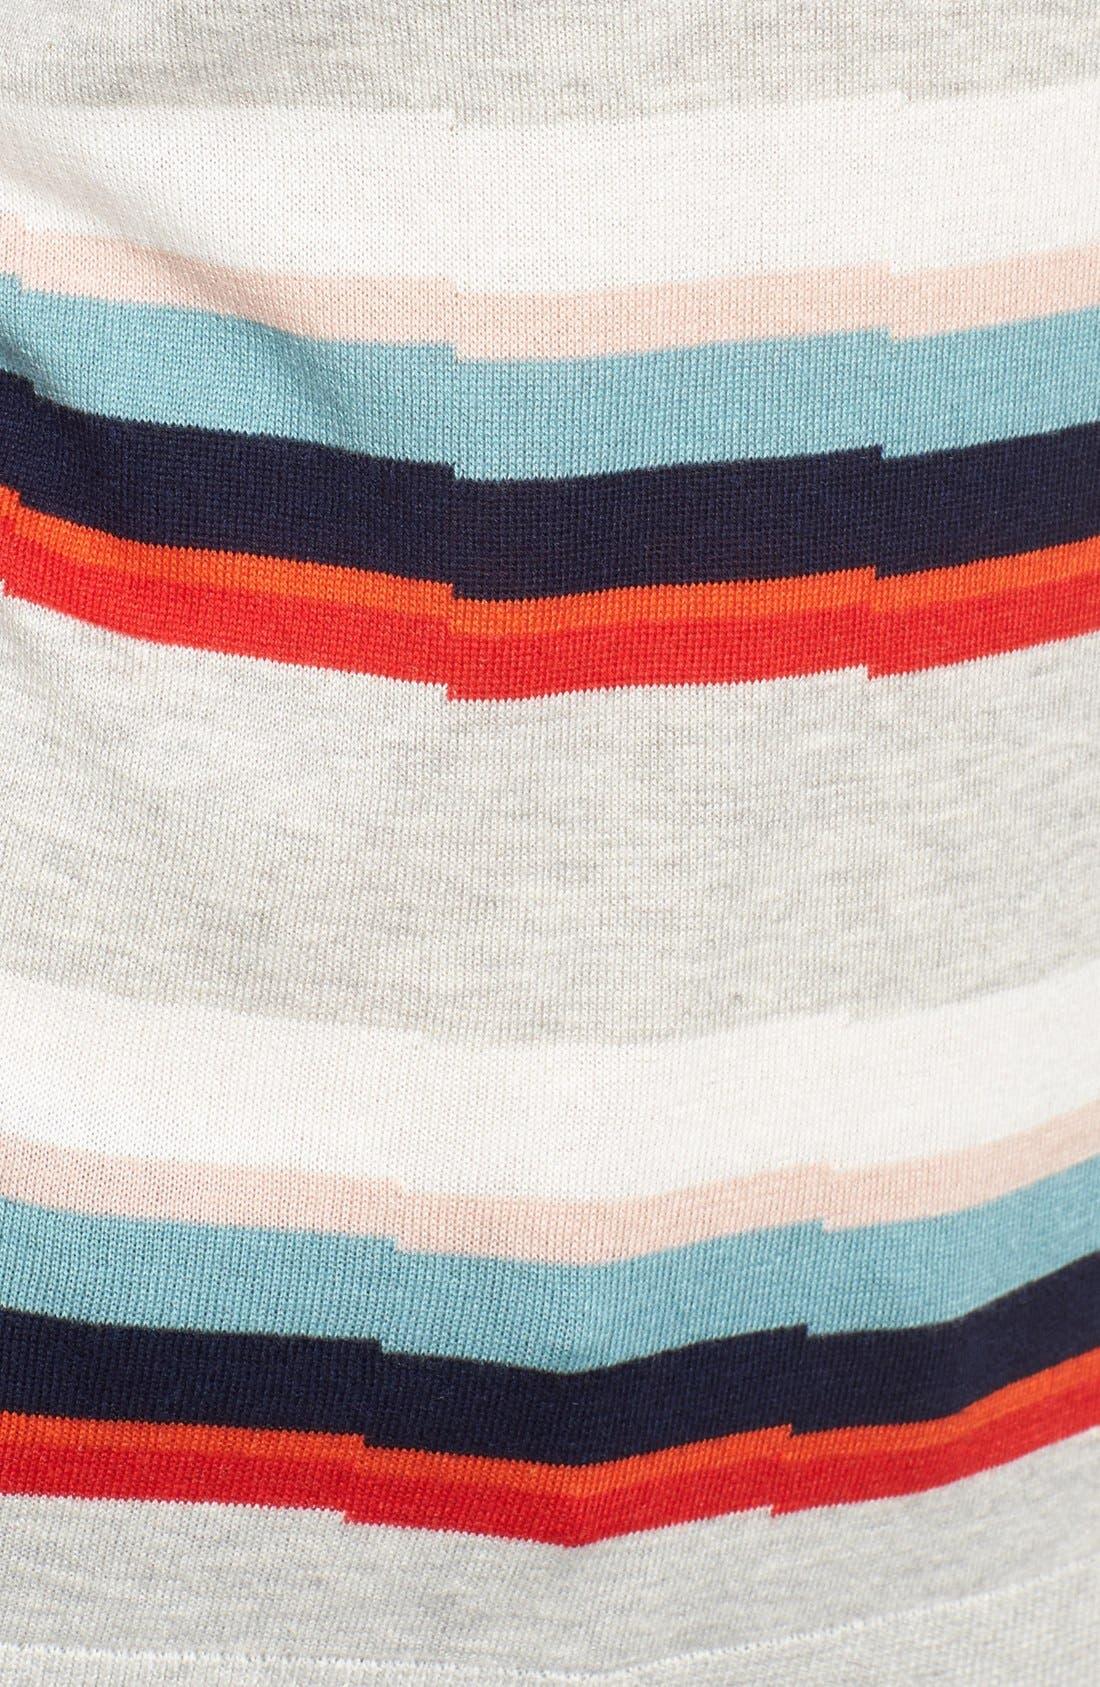 Cotton Blend Pullover,                             Alternate thumbnail 43, color,